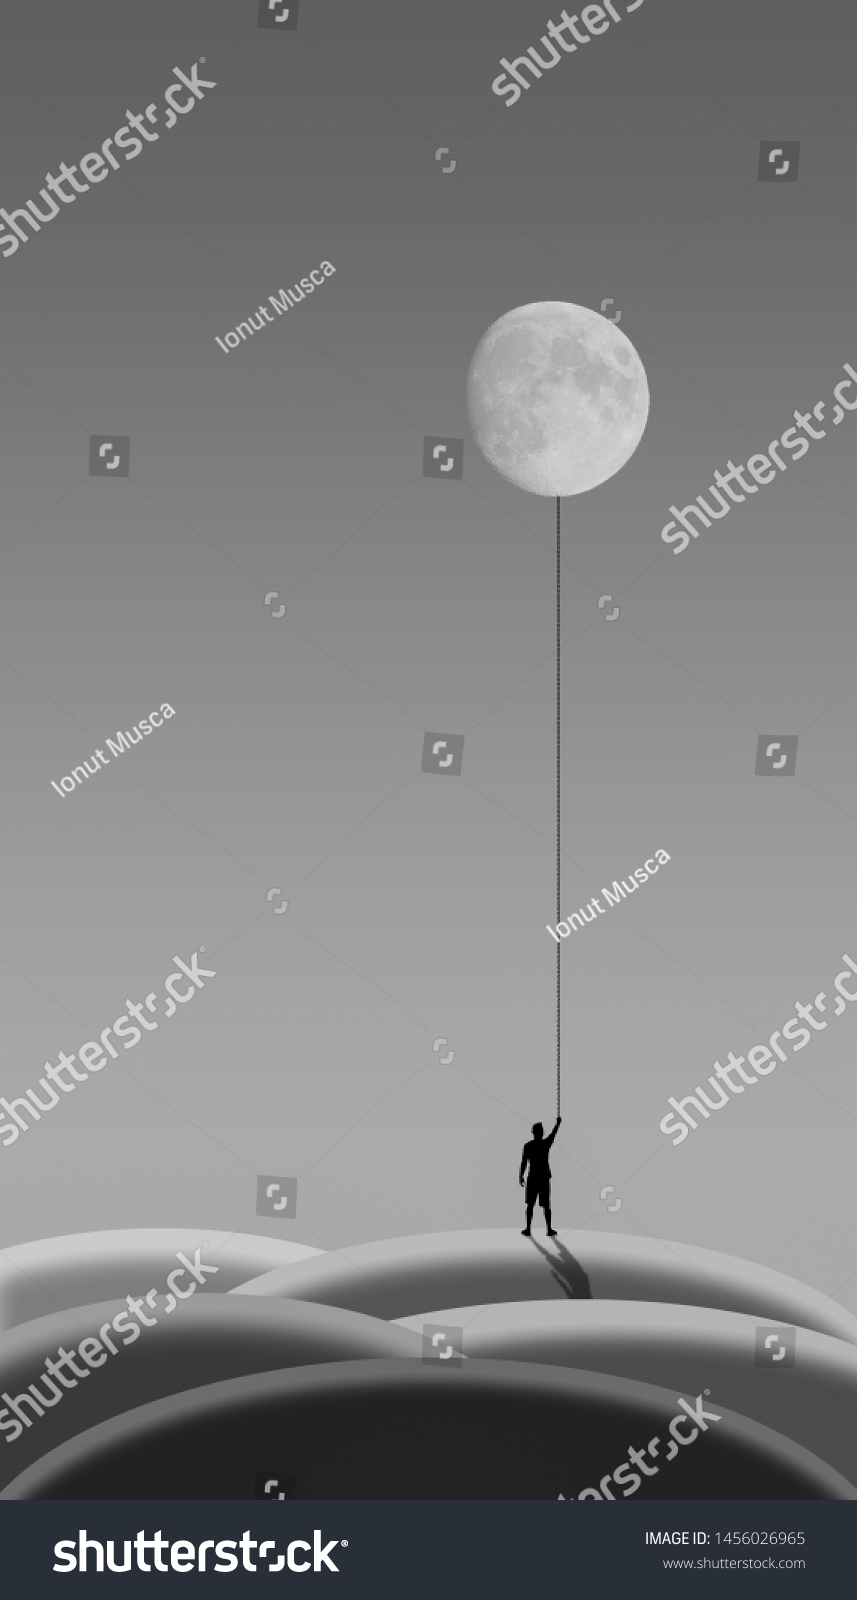 Silhouette Man Holding Moon Monochrome Illustration Stock